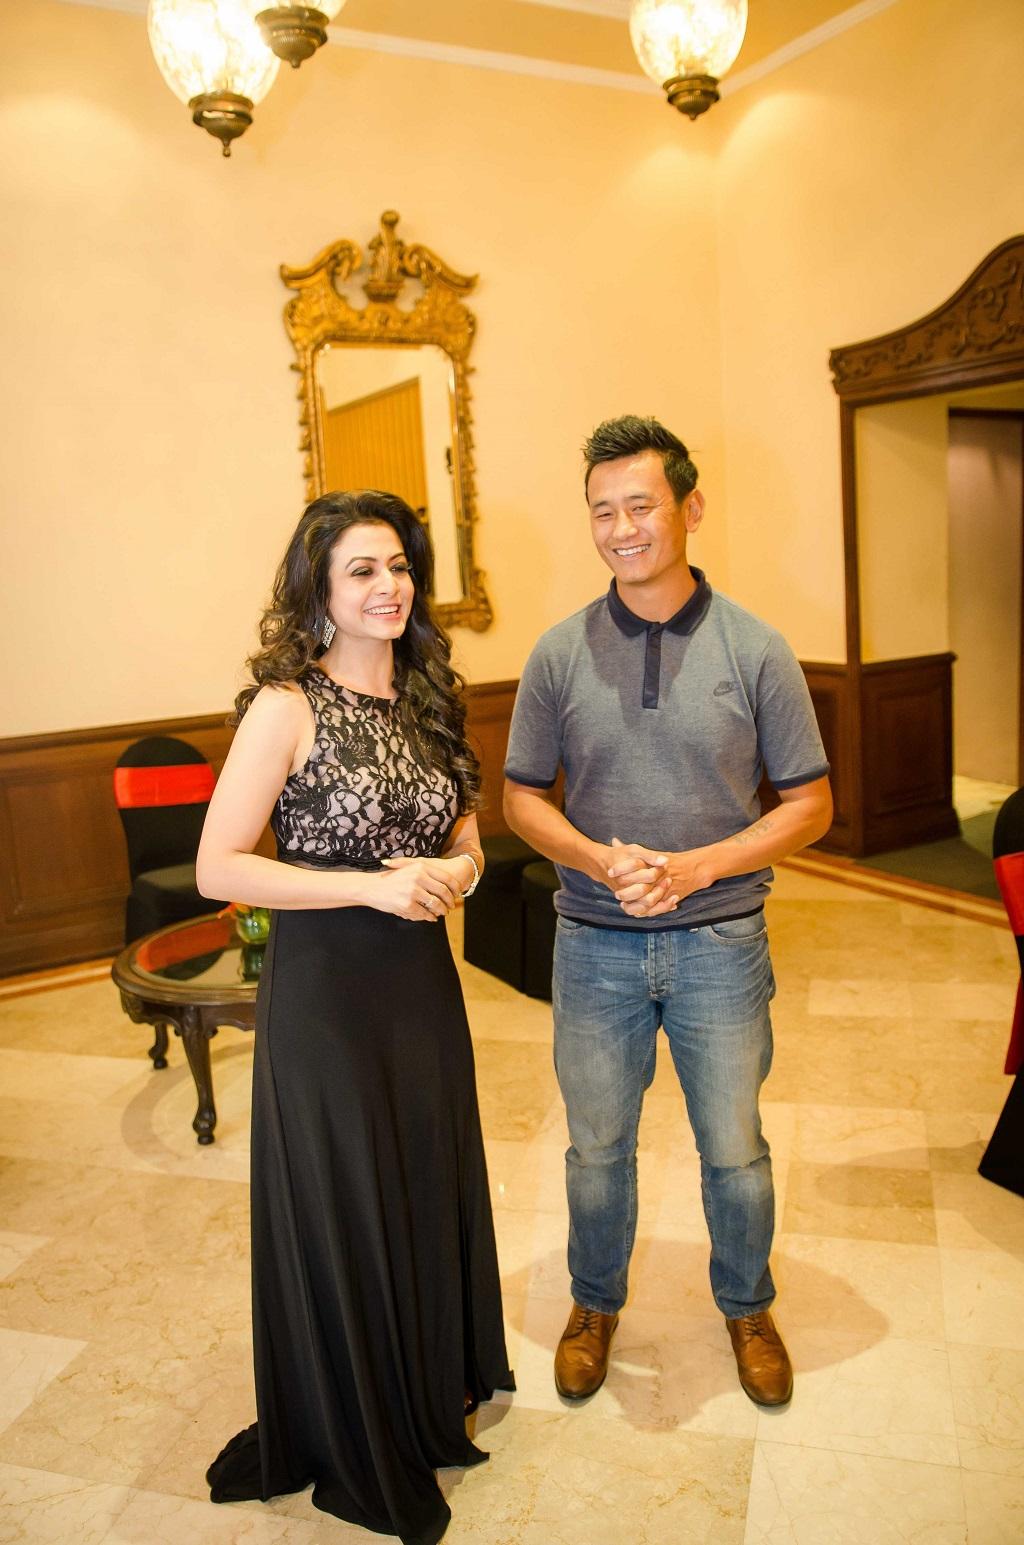 speed-ambassadors-tollywood-actress-koel-mallick-with-footballer-bhaichung-bhutia